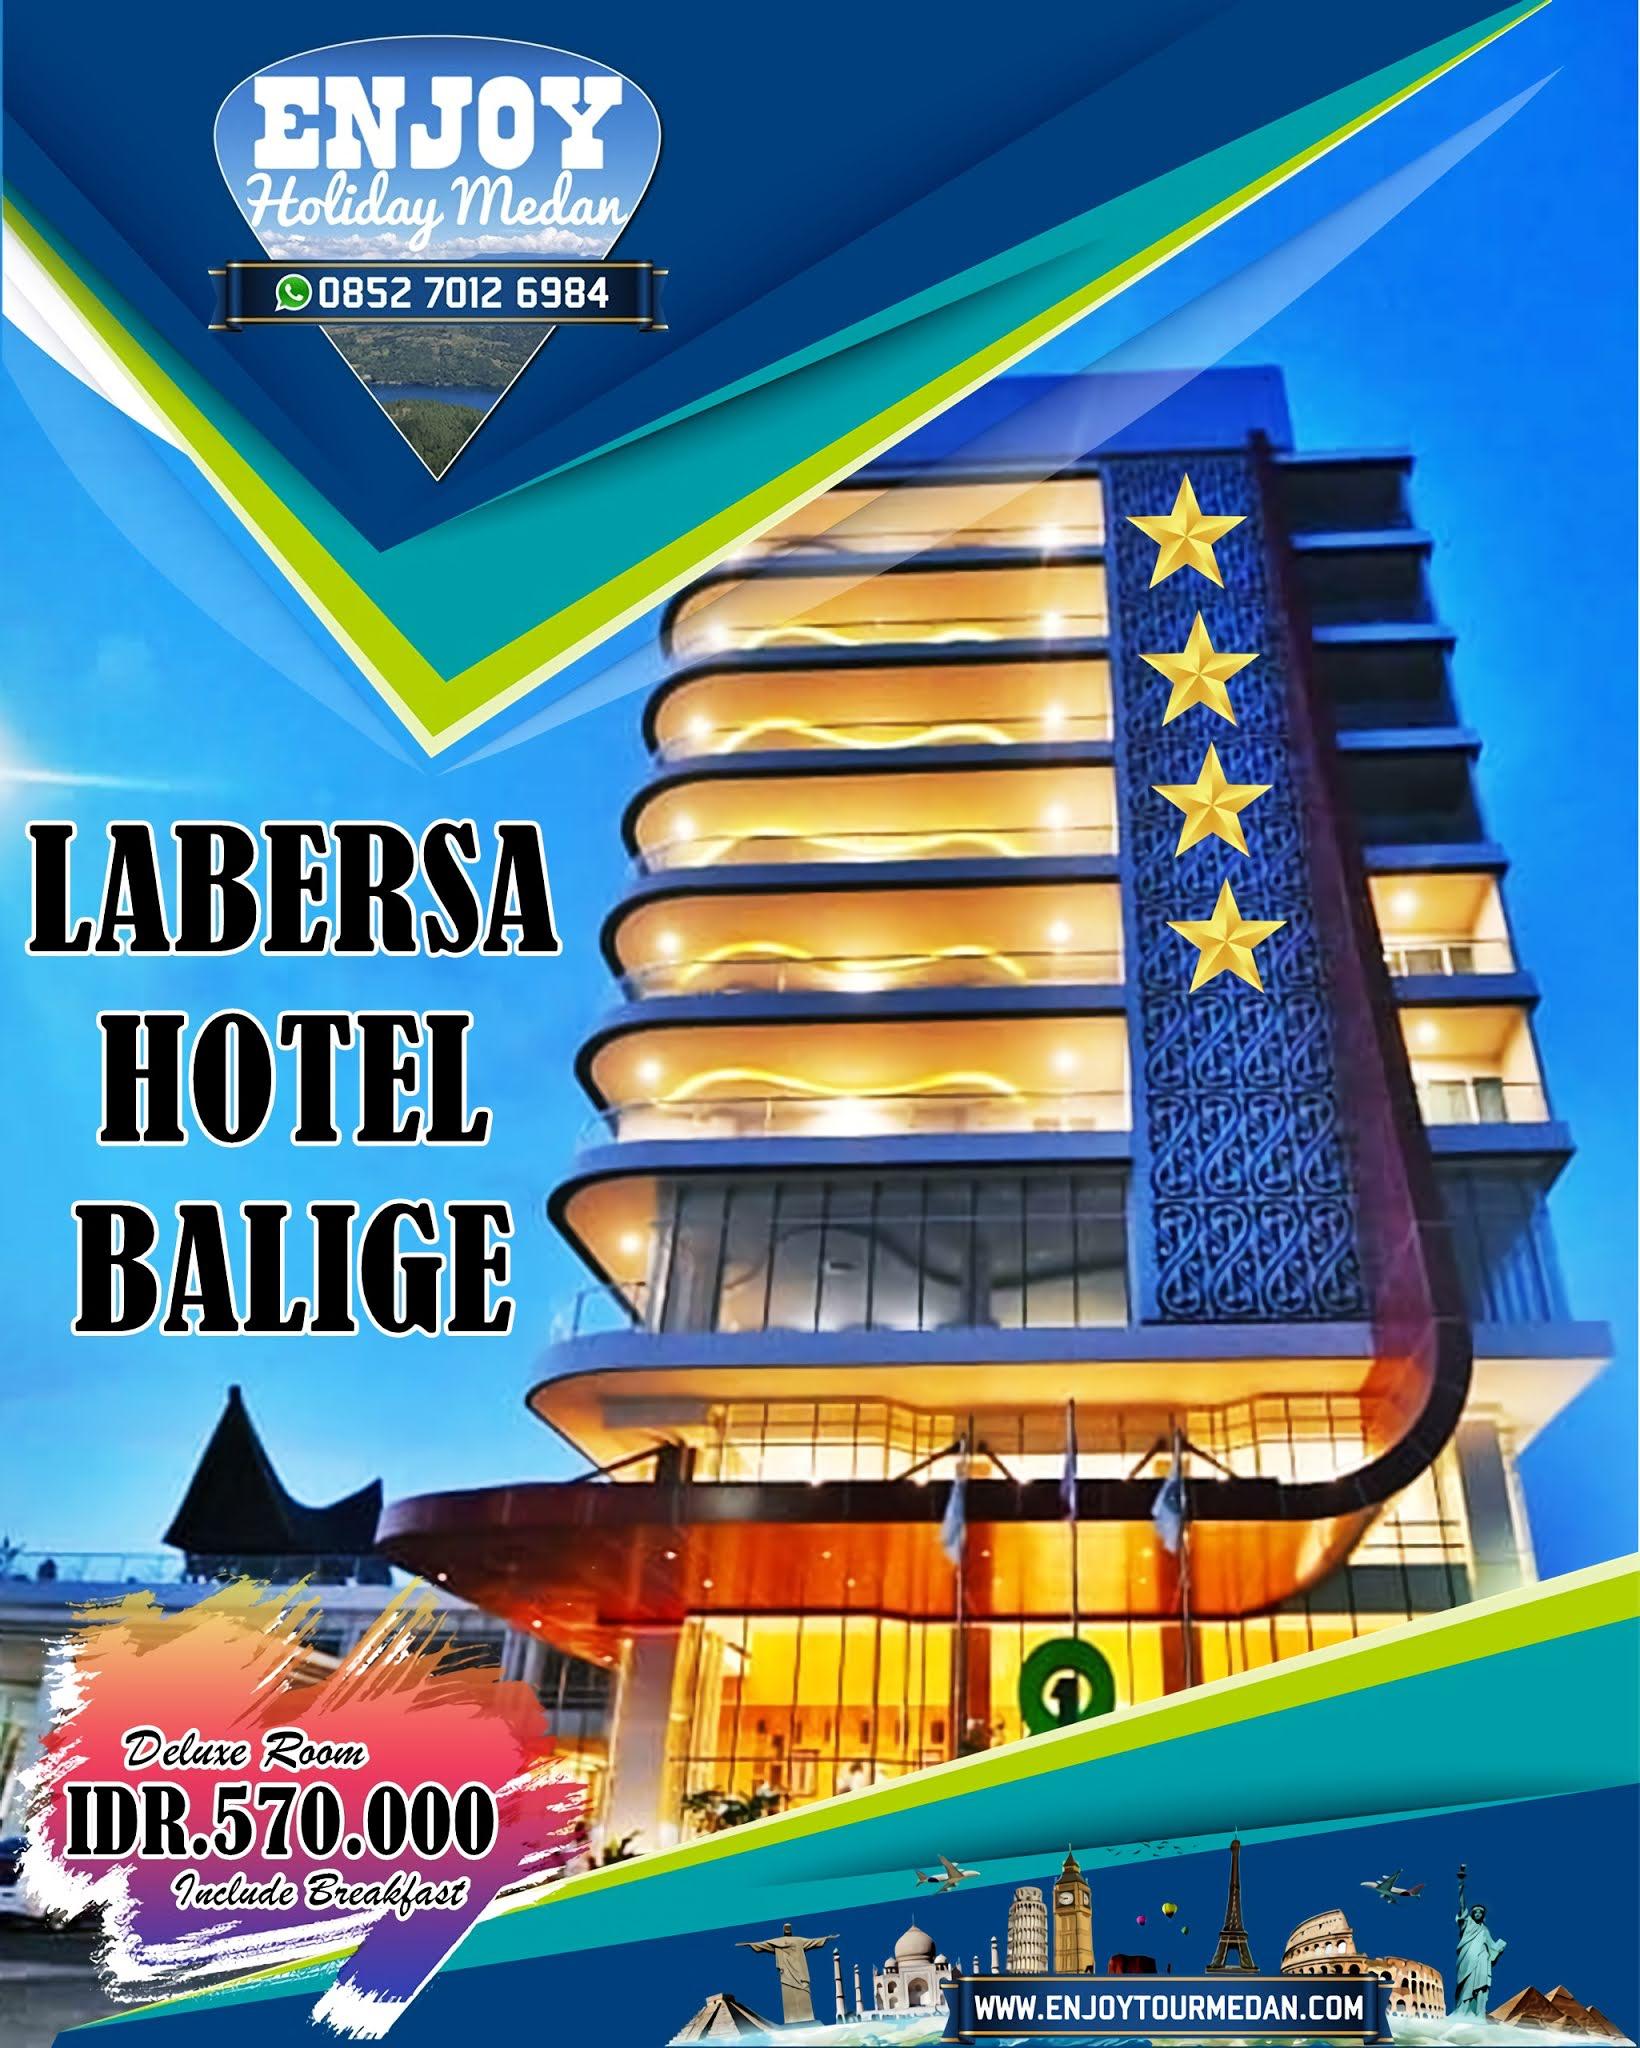 Labersa Hotel Balige